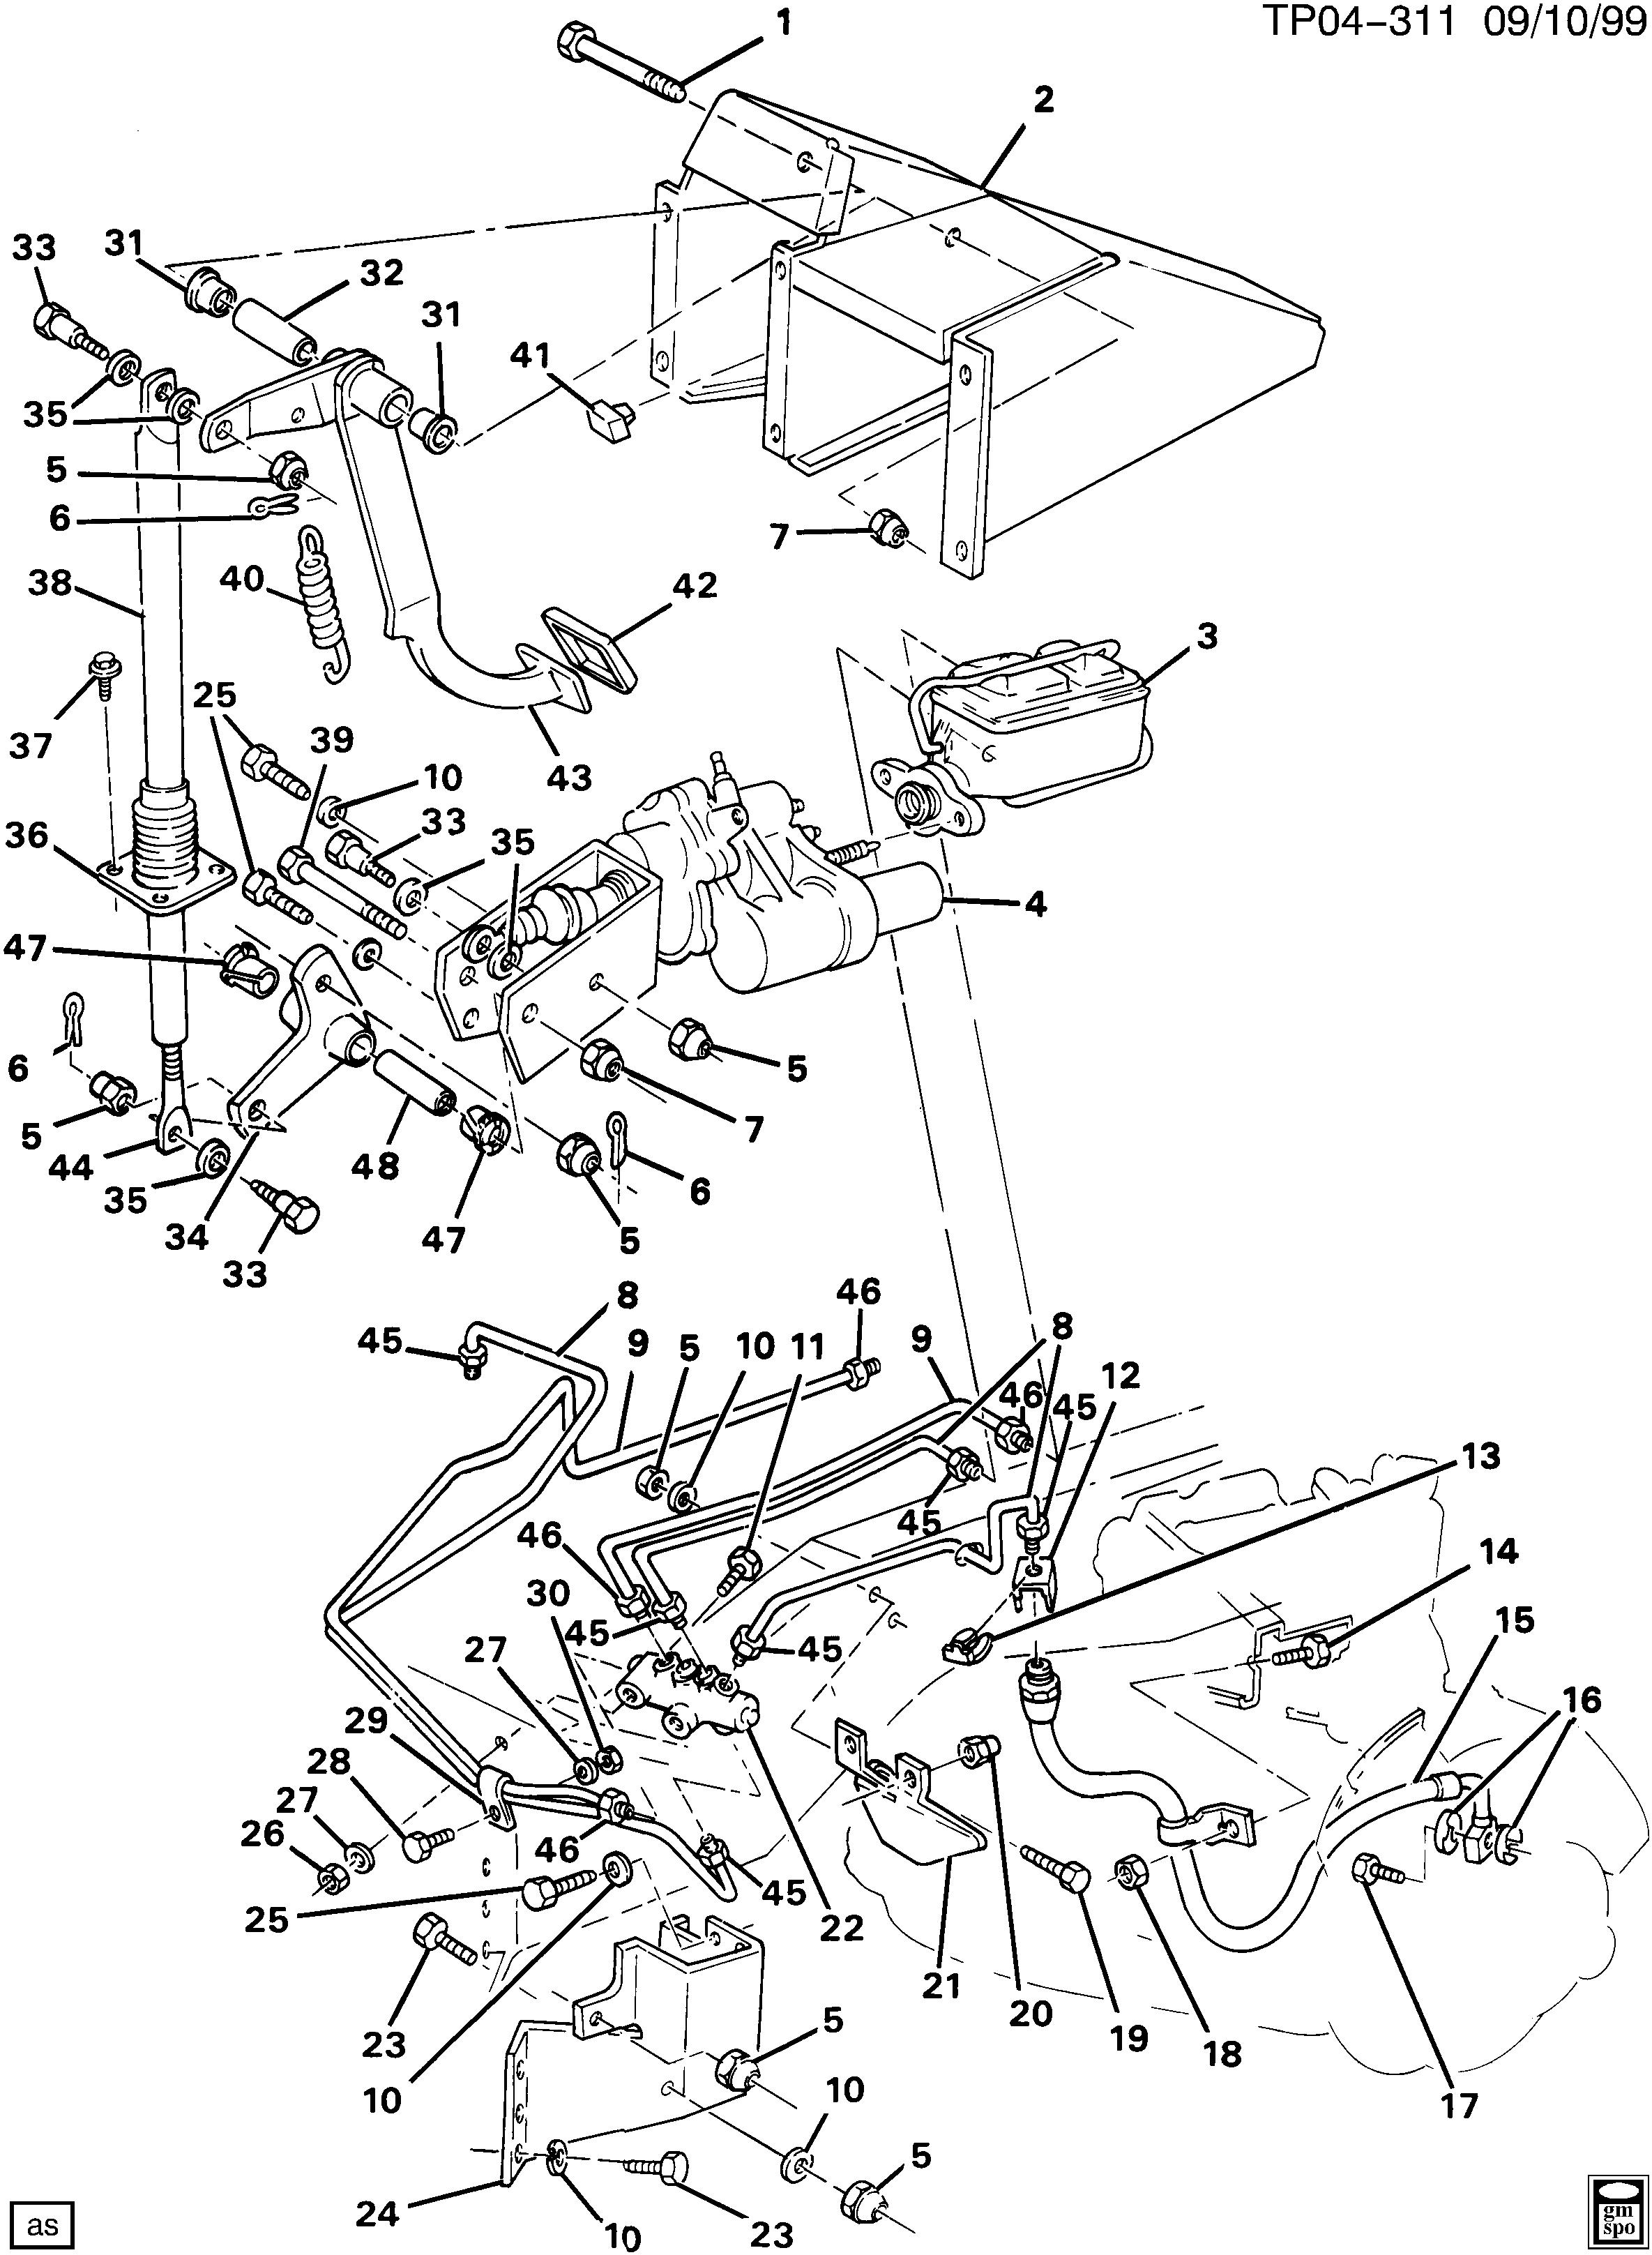 gmc p25  p2500 van  jb8  jf9